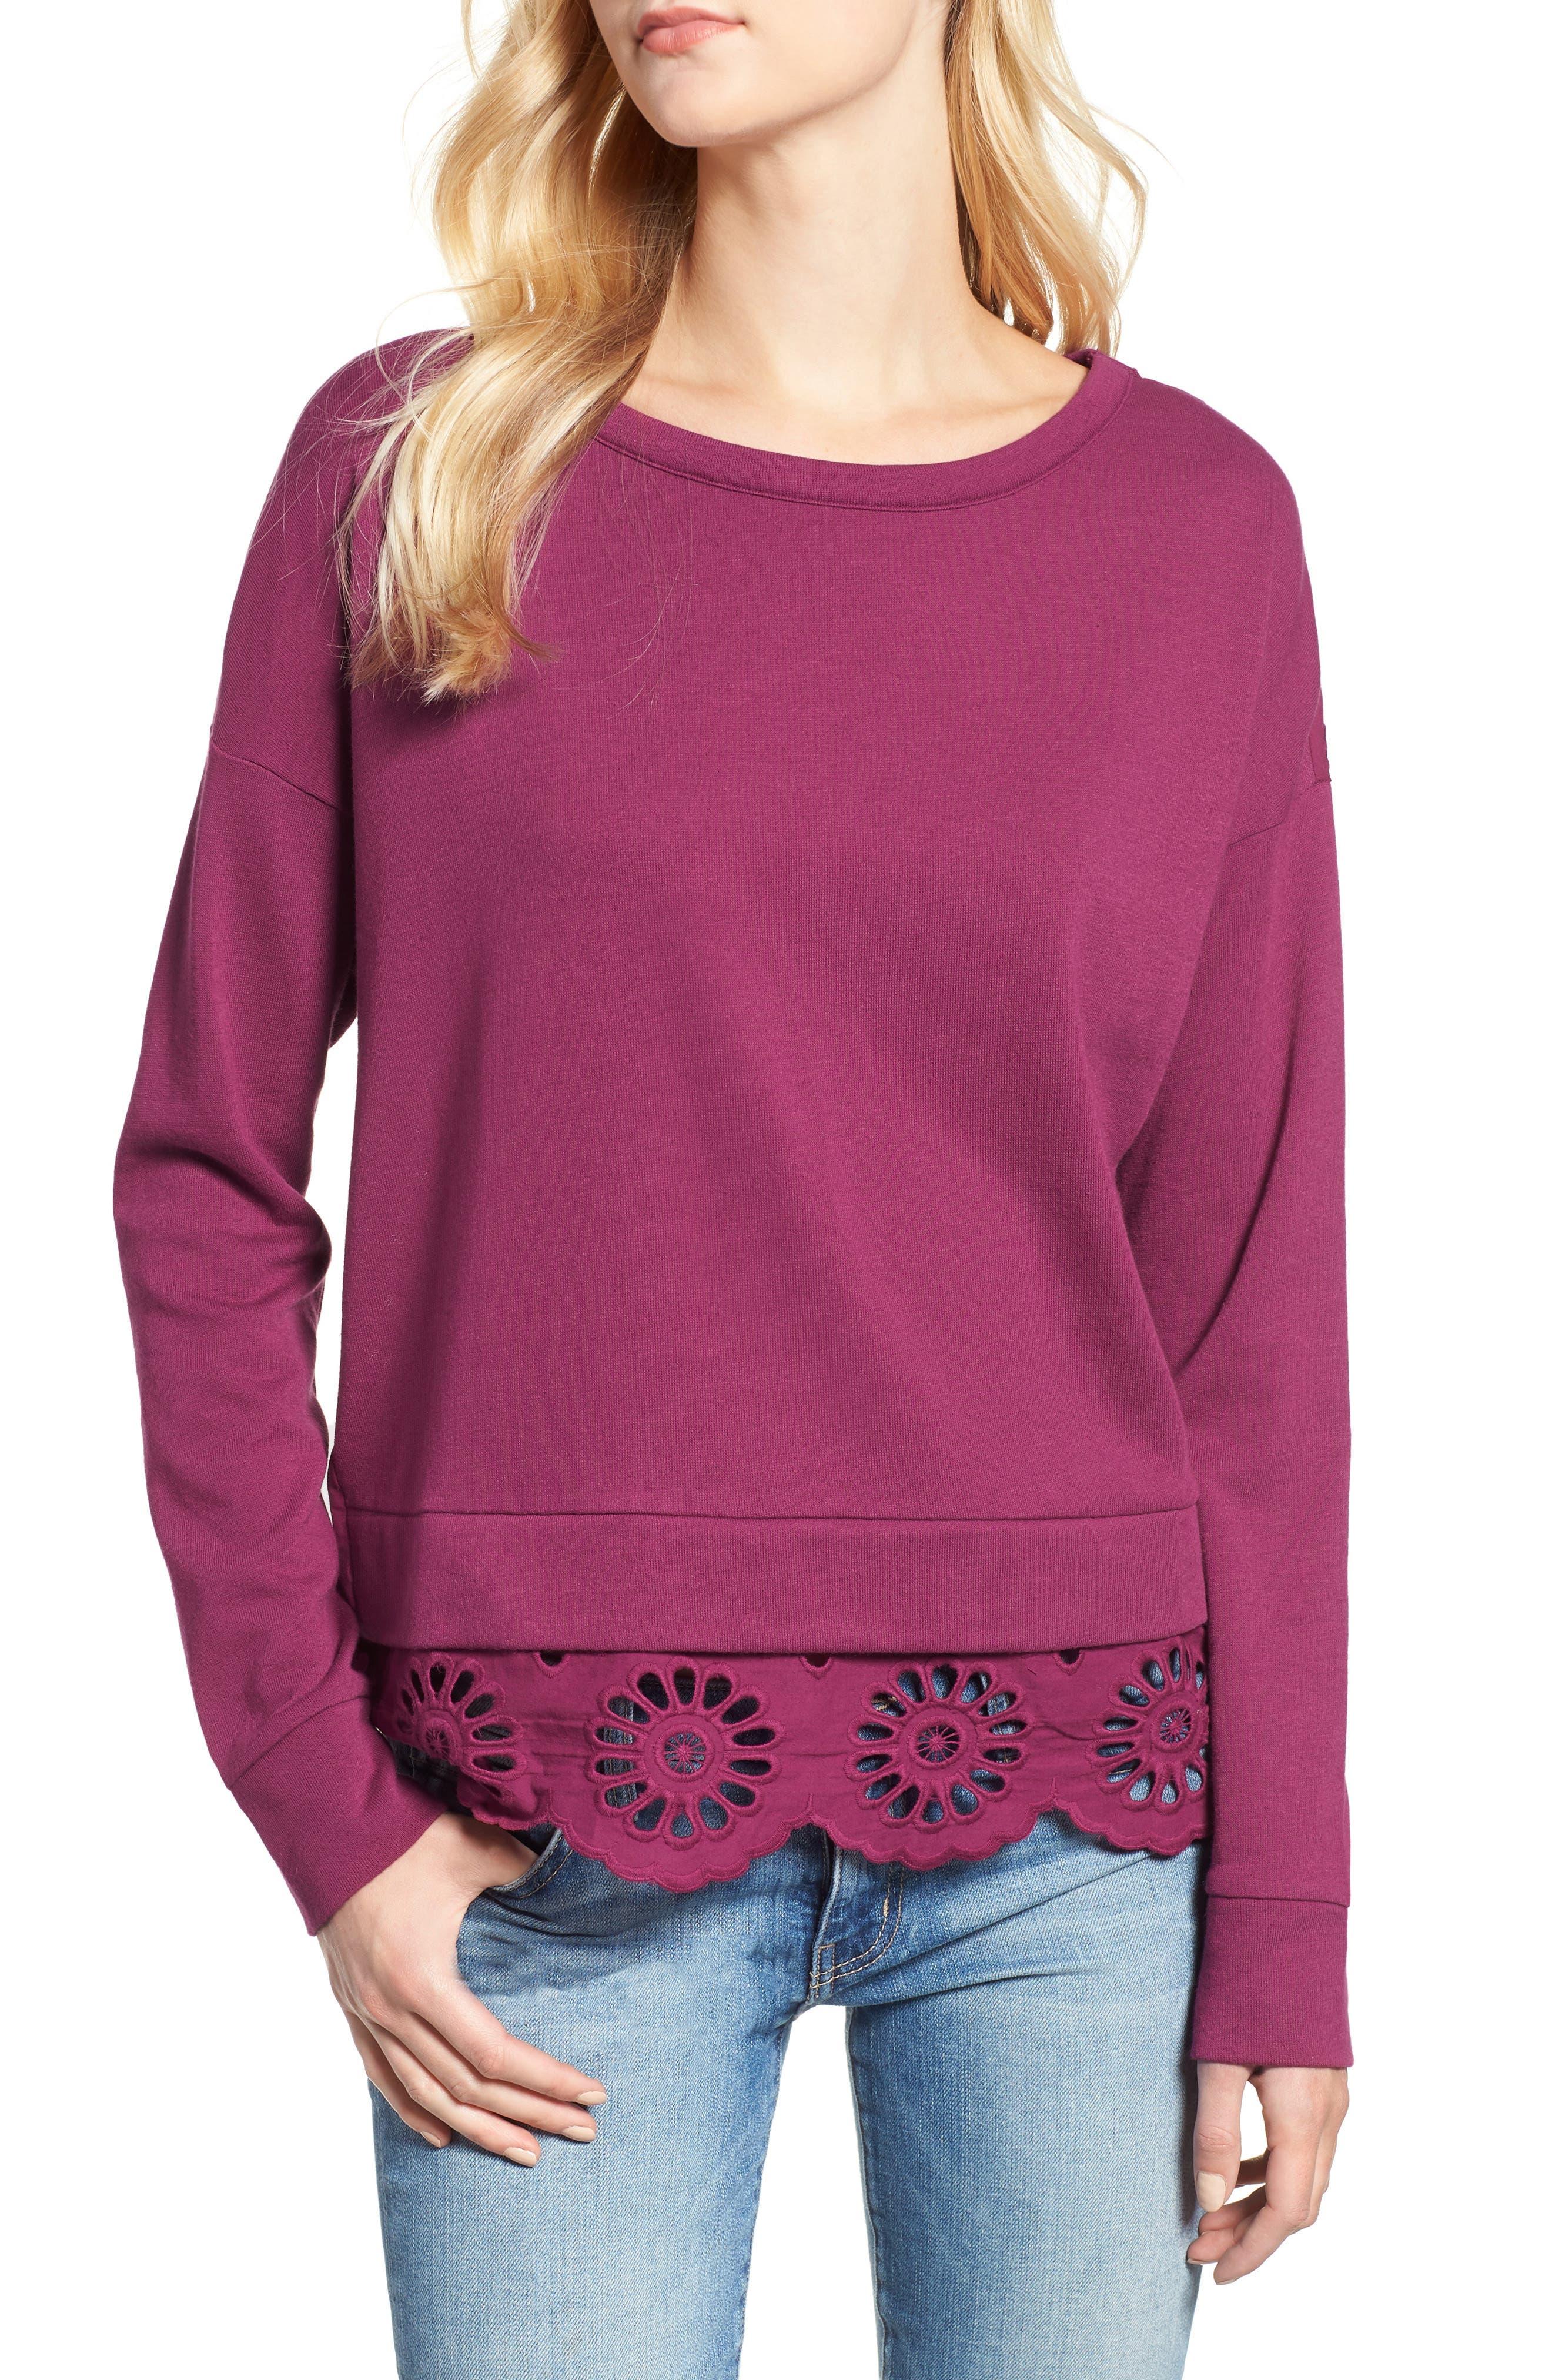 Eyelet Trim Sweatshirt,                             Main thumbnail 1, color,                             PURPLE FUCHSIA